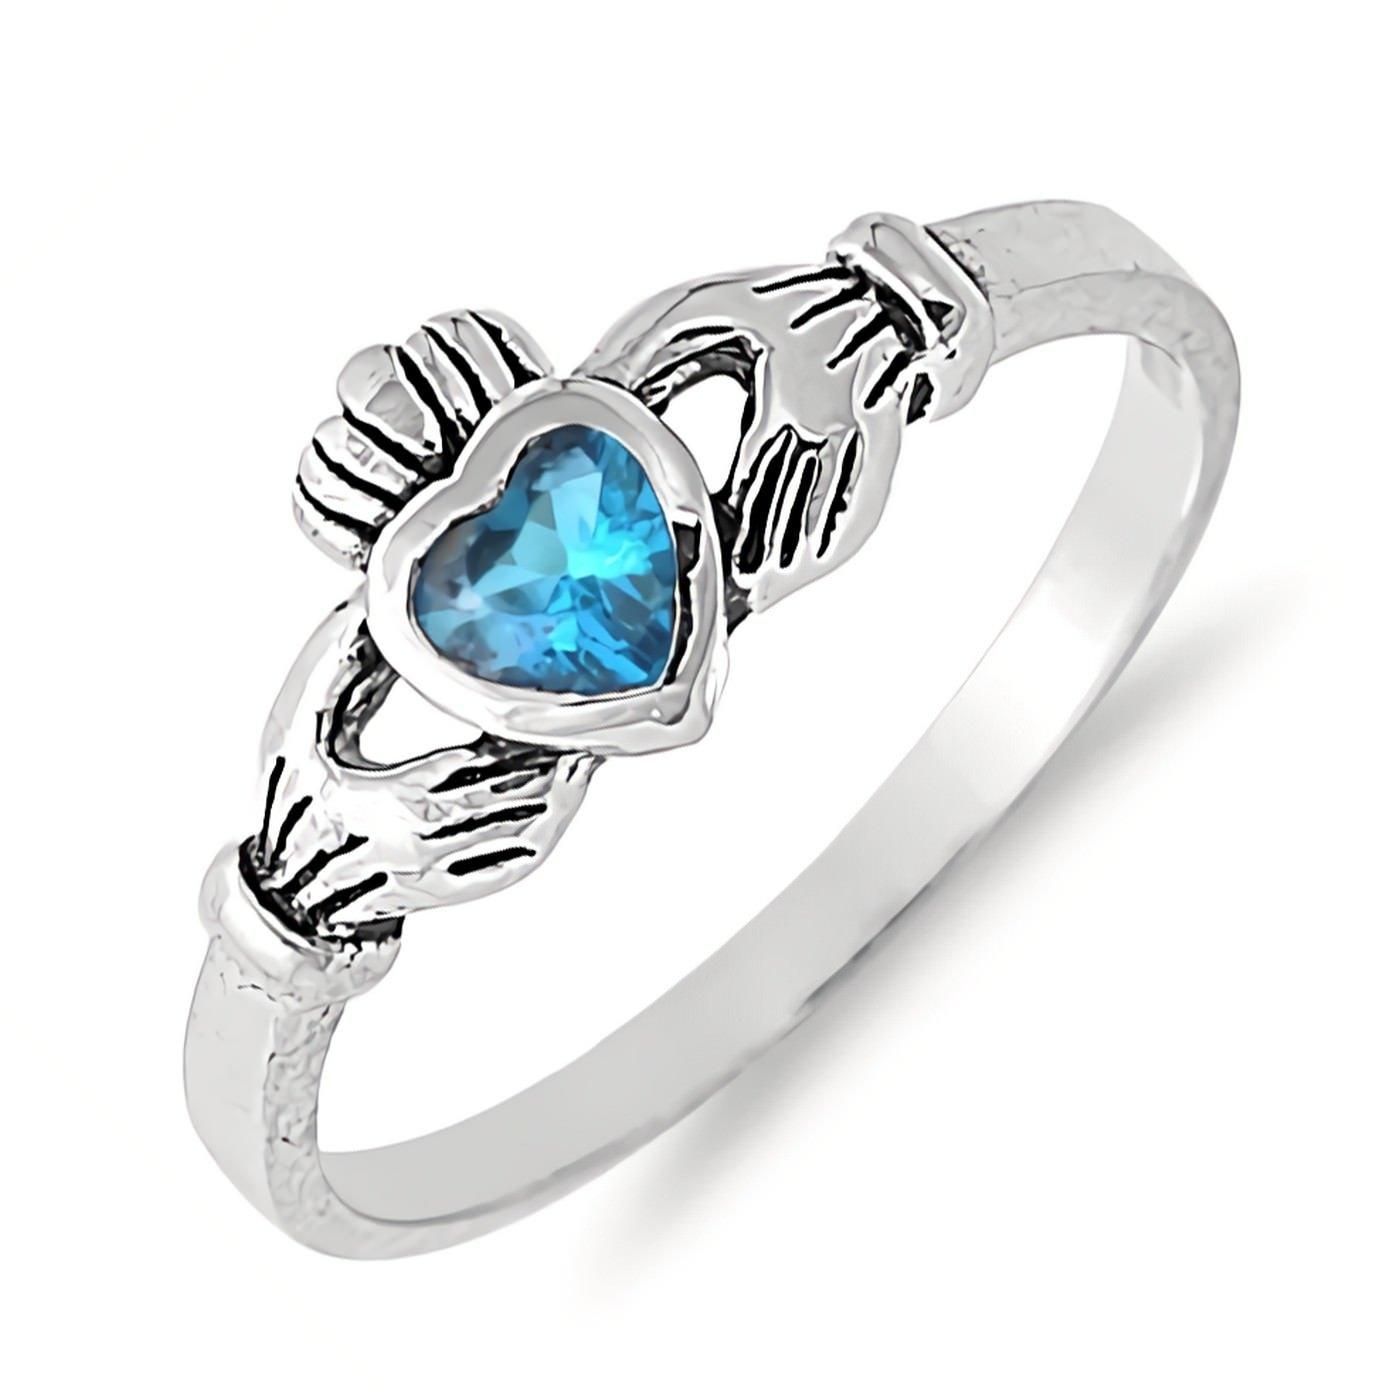 Traditional Irish Claddagh Ring Simulated Birthstone Sterling Silver Girls Womens Size 7 - Blue Topaz